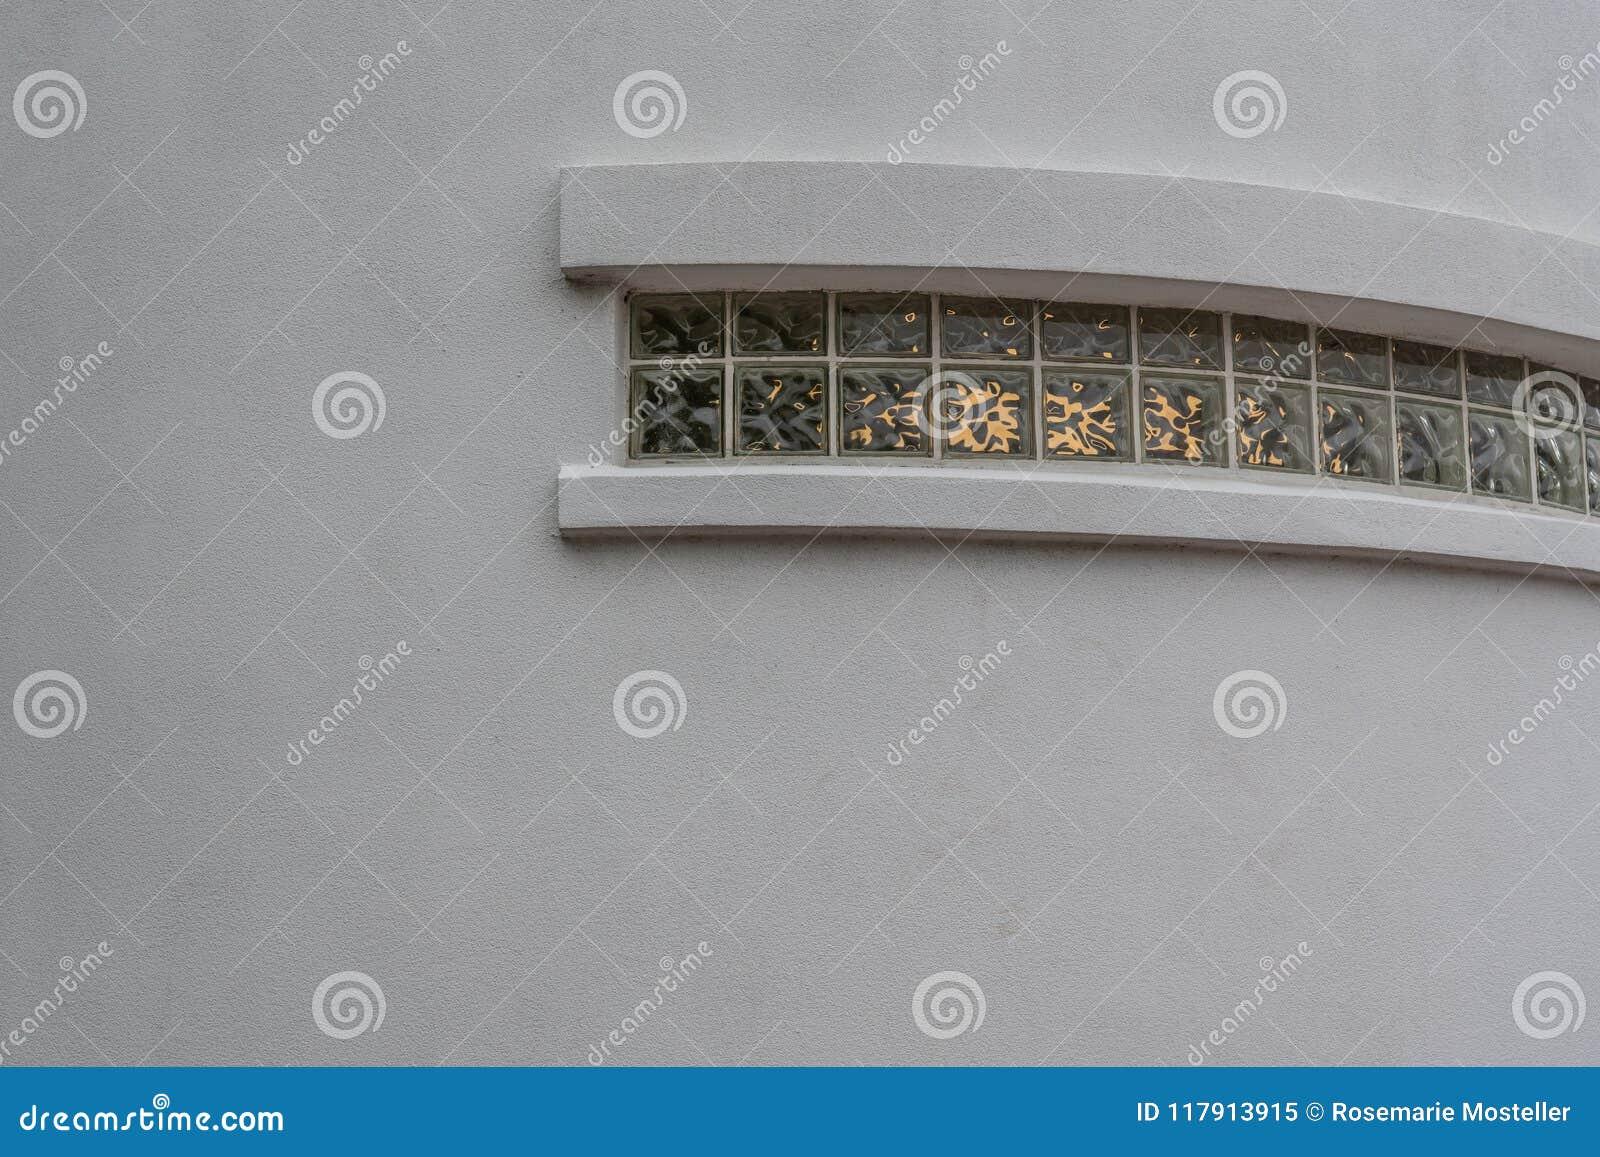 Glass block window architectural detail